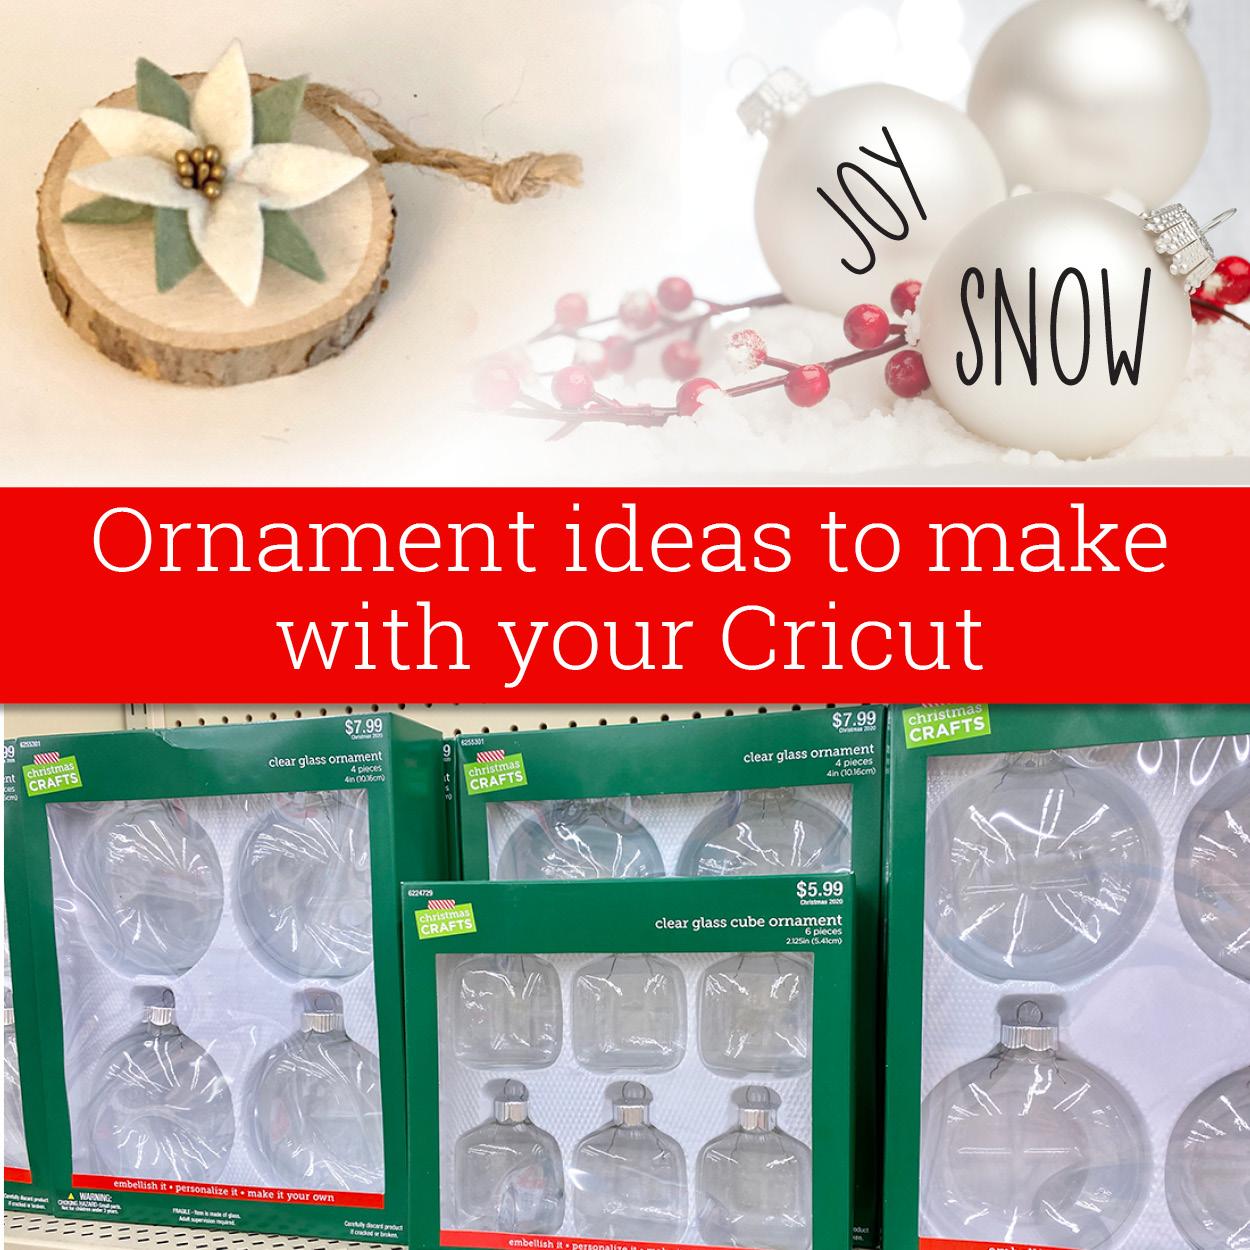 Ornament ideas for Cricut